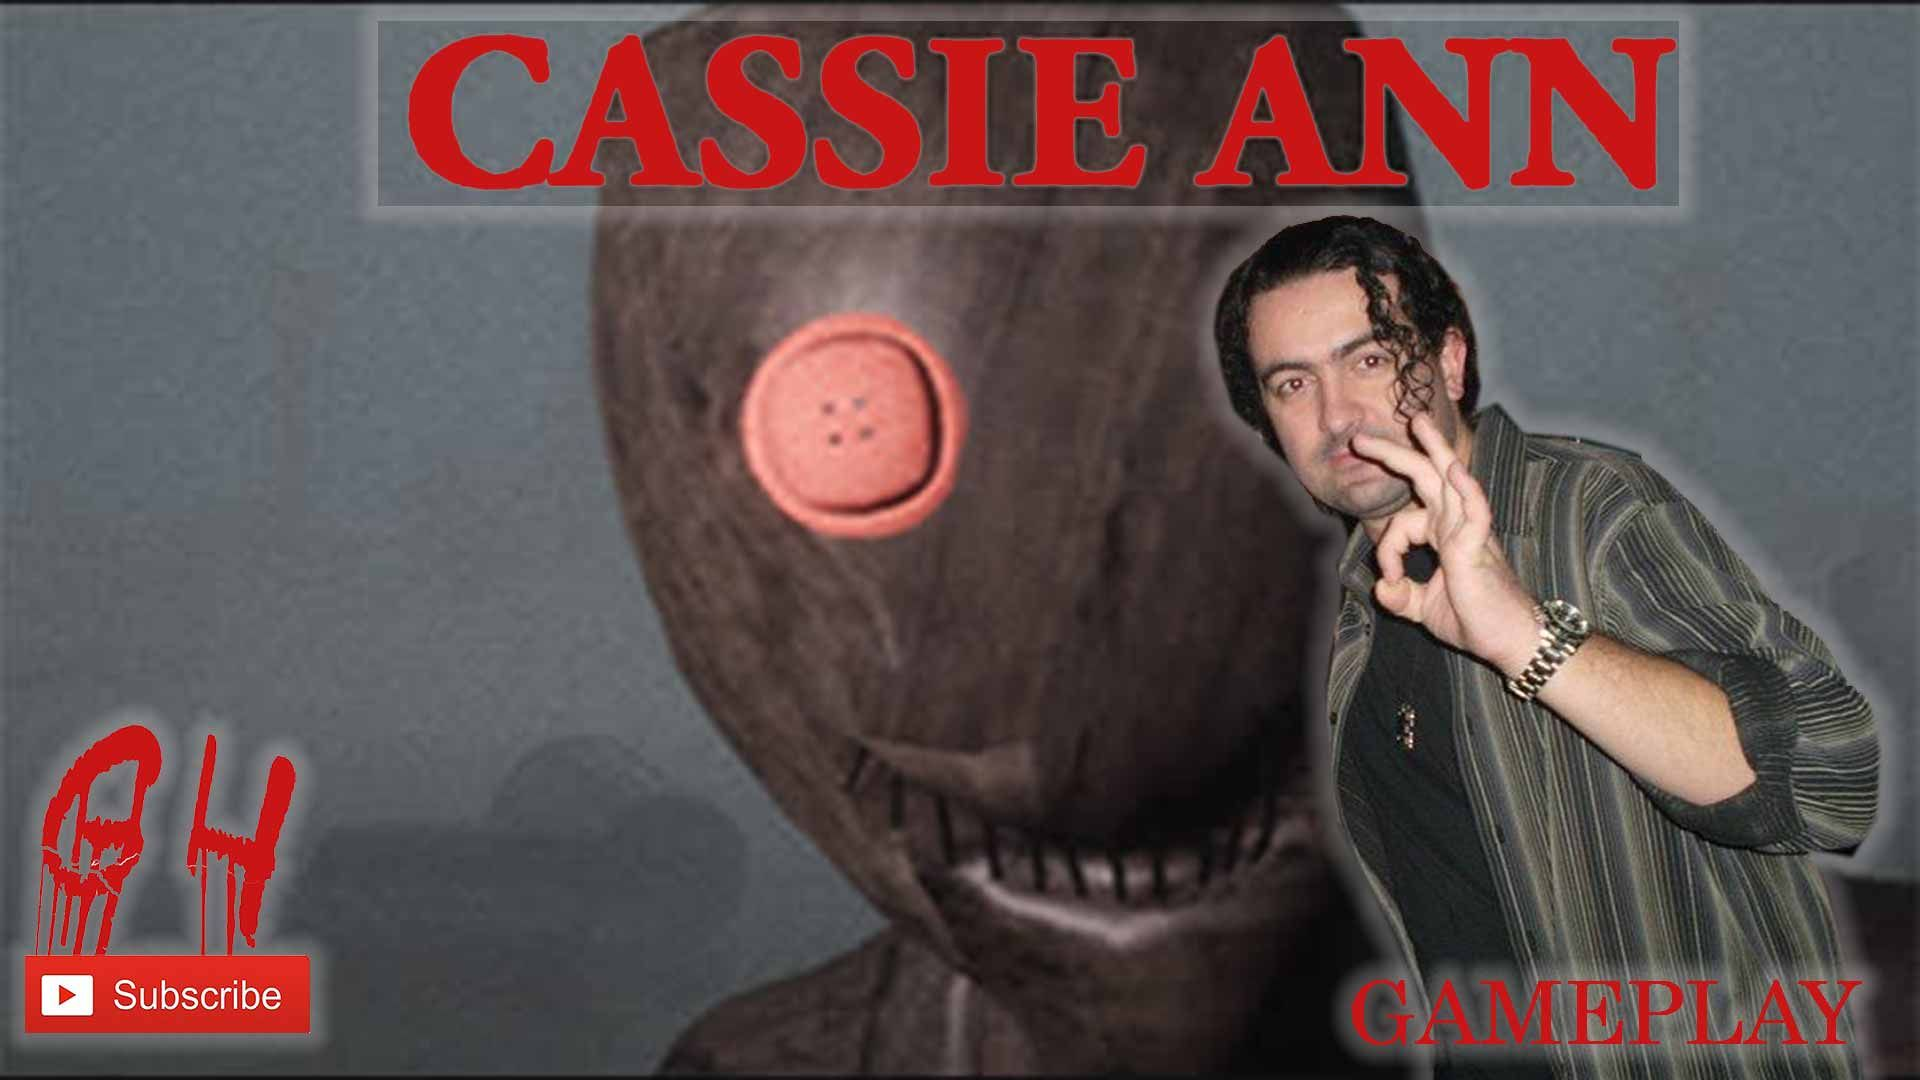 Cassie ann the possesed doll gameplay cassie anne